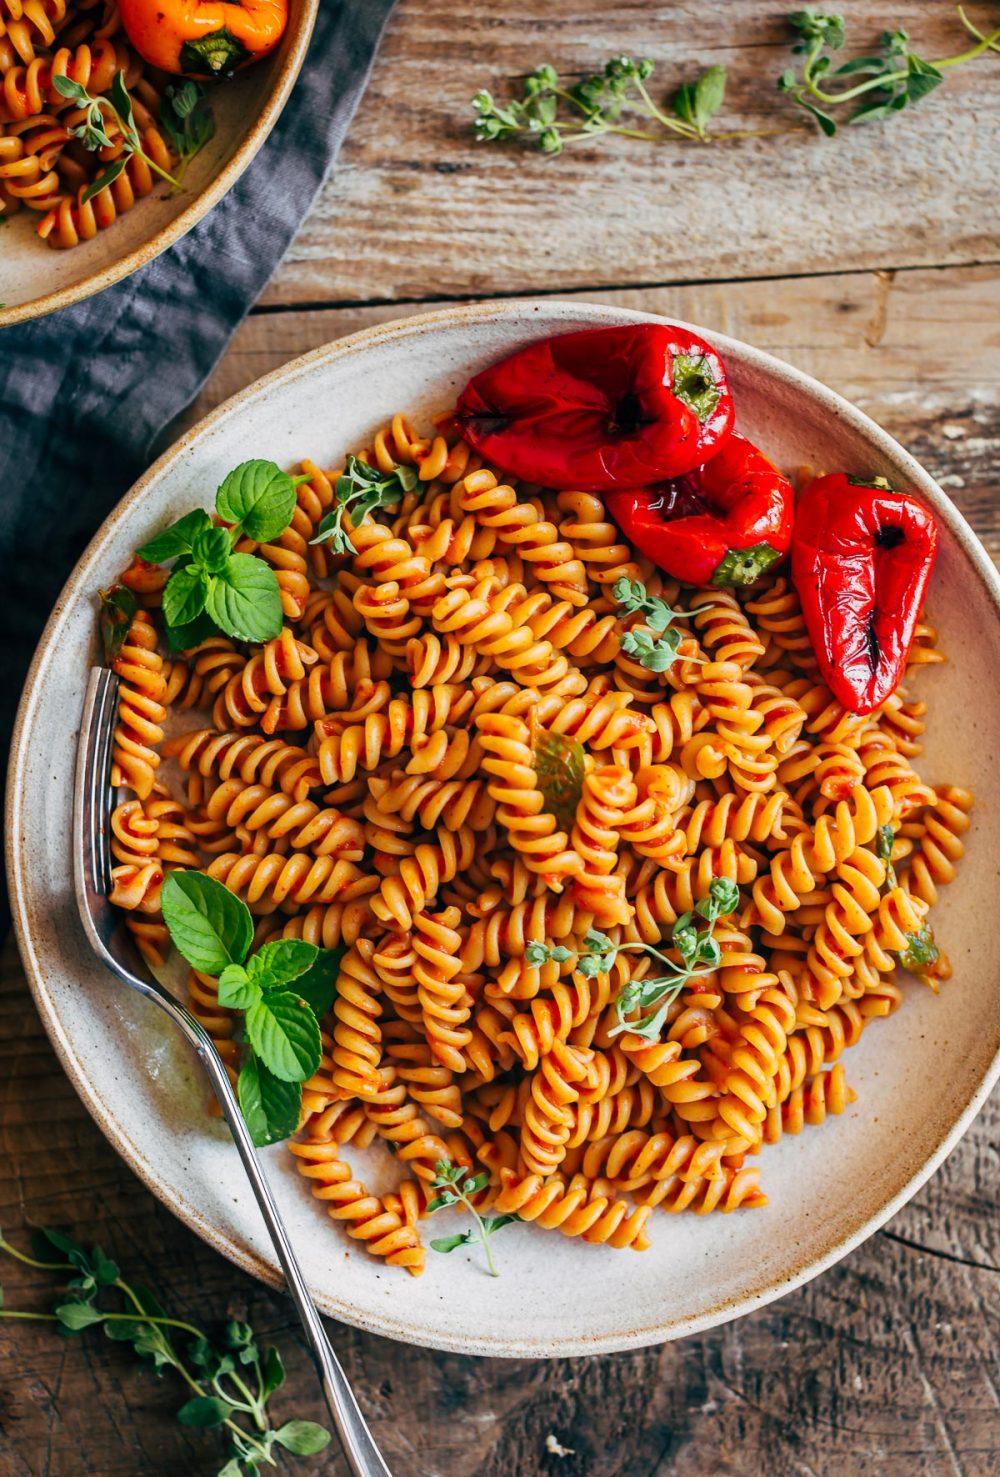 cremosa pasta conSALSA ai PEPERONI arrostiti creamy vegan roasted red pepper pasta